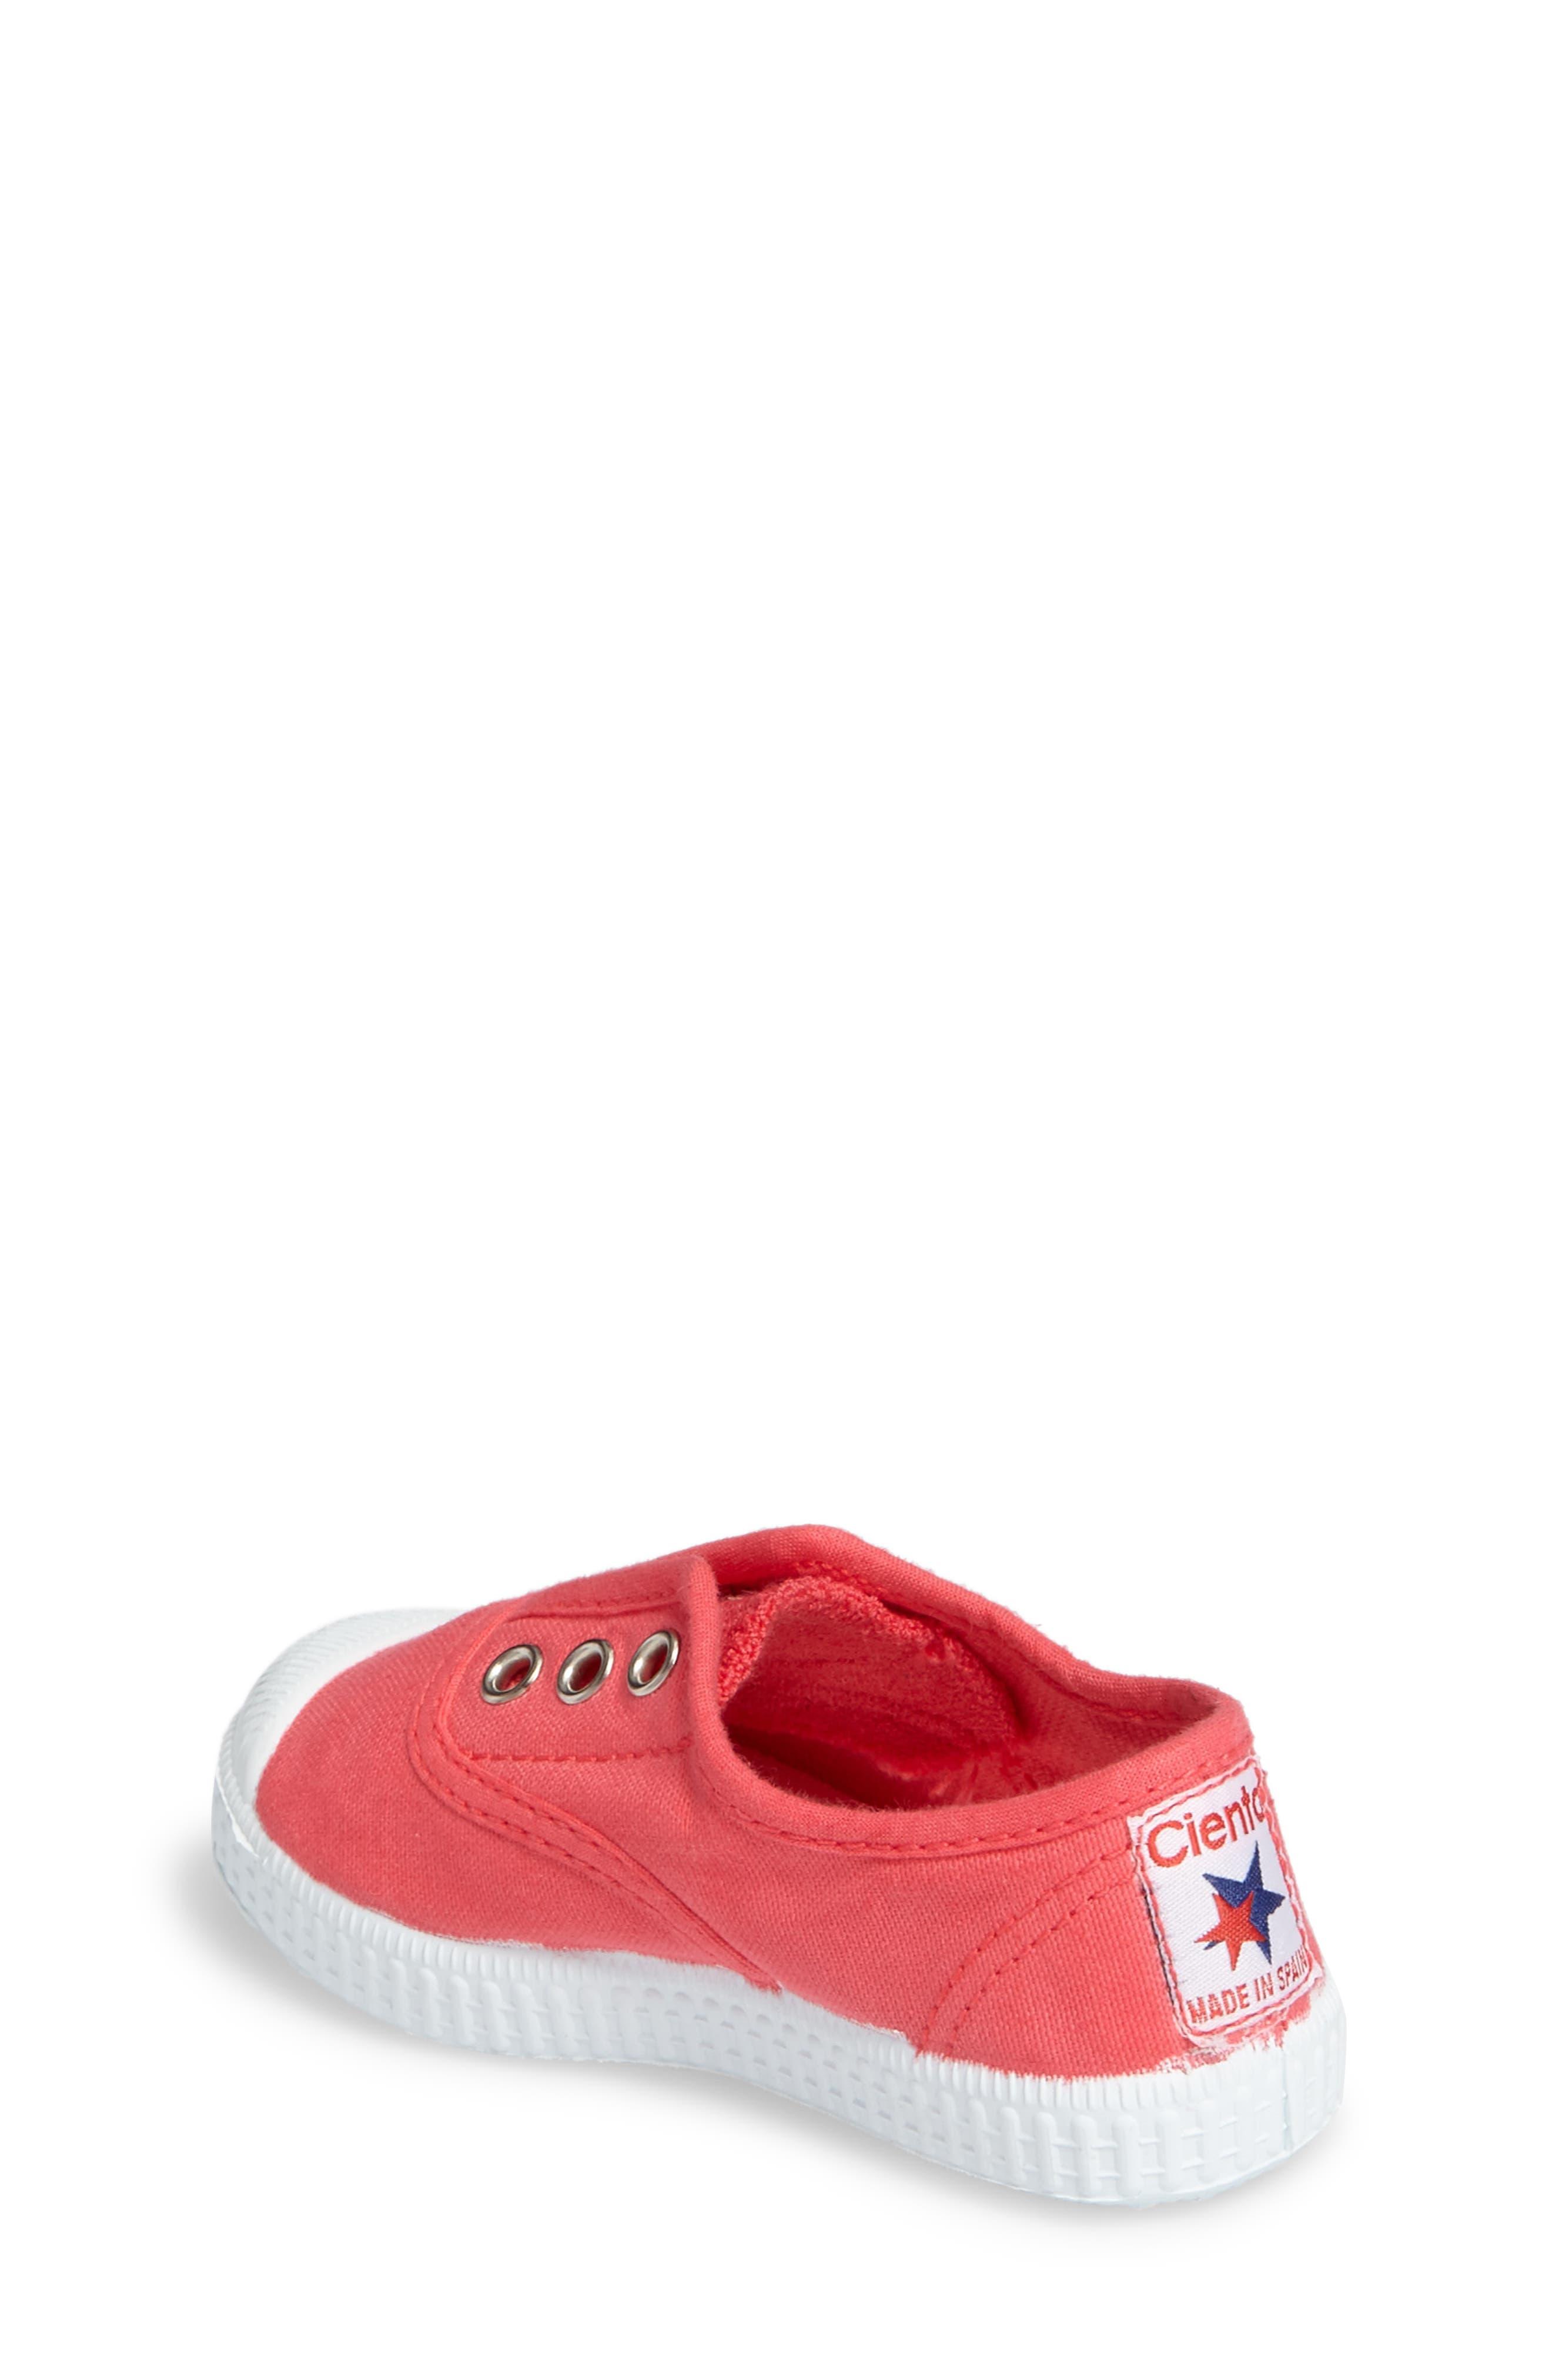 Alternate Image 2  - Cienta Laceless Slip-On Sneaker (Walker & Toddler)